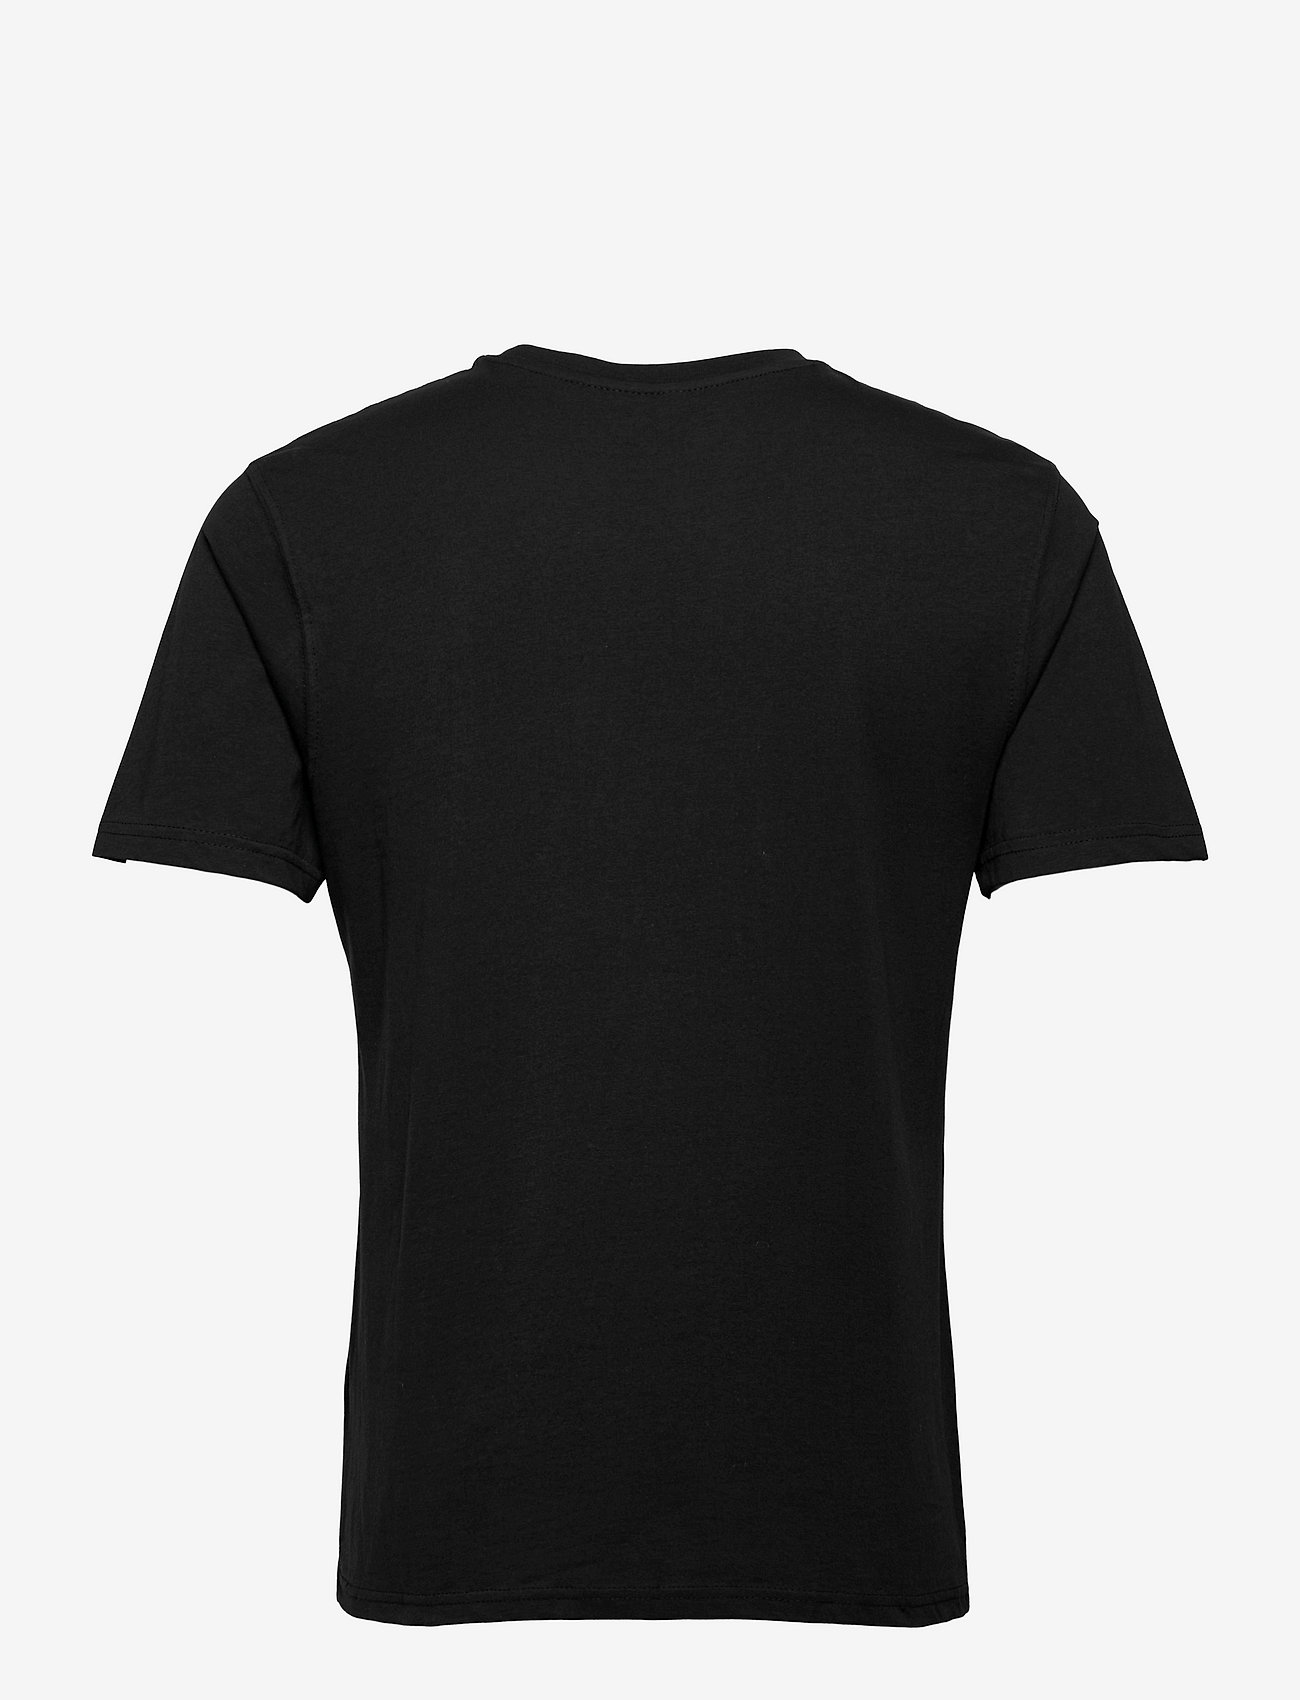 Fanatics - Anaheim Ducks Iconic Primary Colour Logo Graphic T-Shirt - t-shirts - black - 1